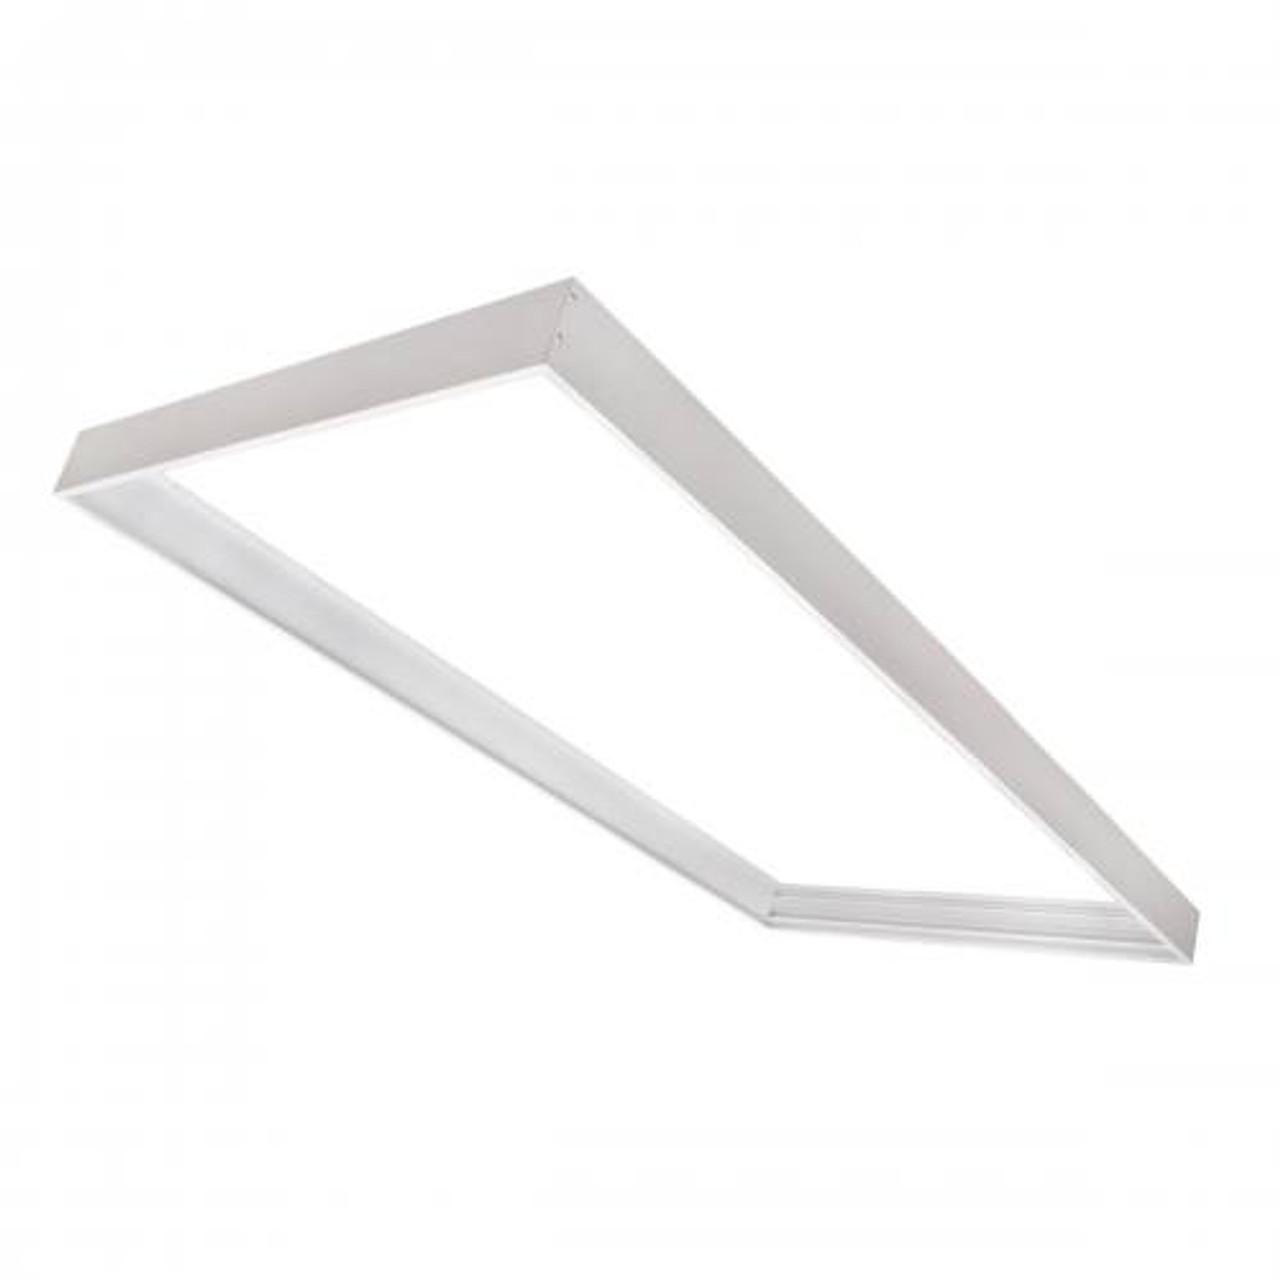 Surface Mount Kit for 2x4 LED Flat Panel Light (AL-SMKT24)